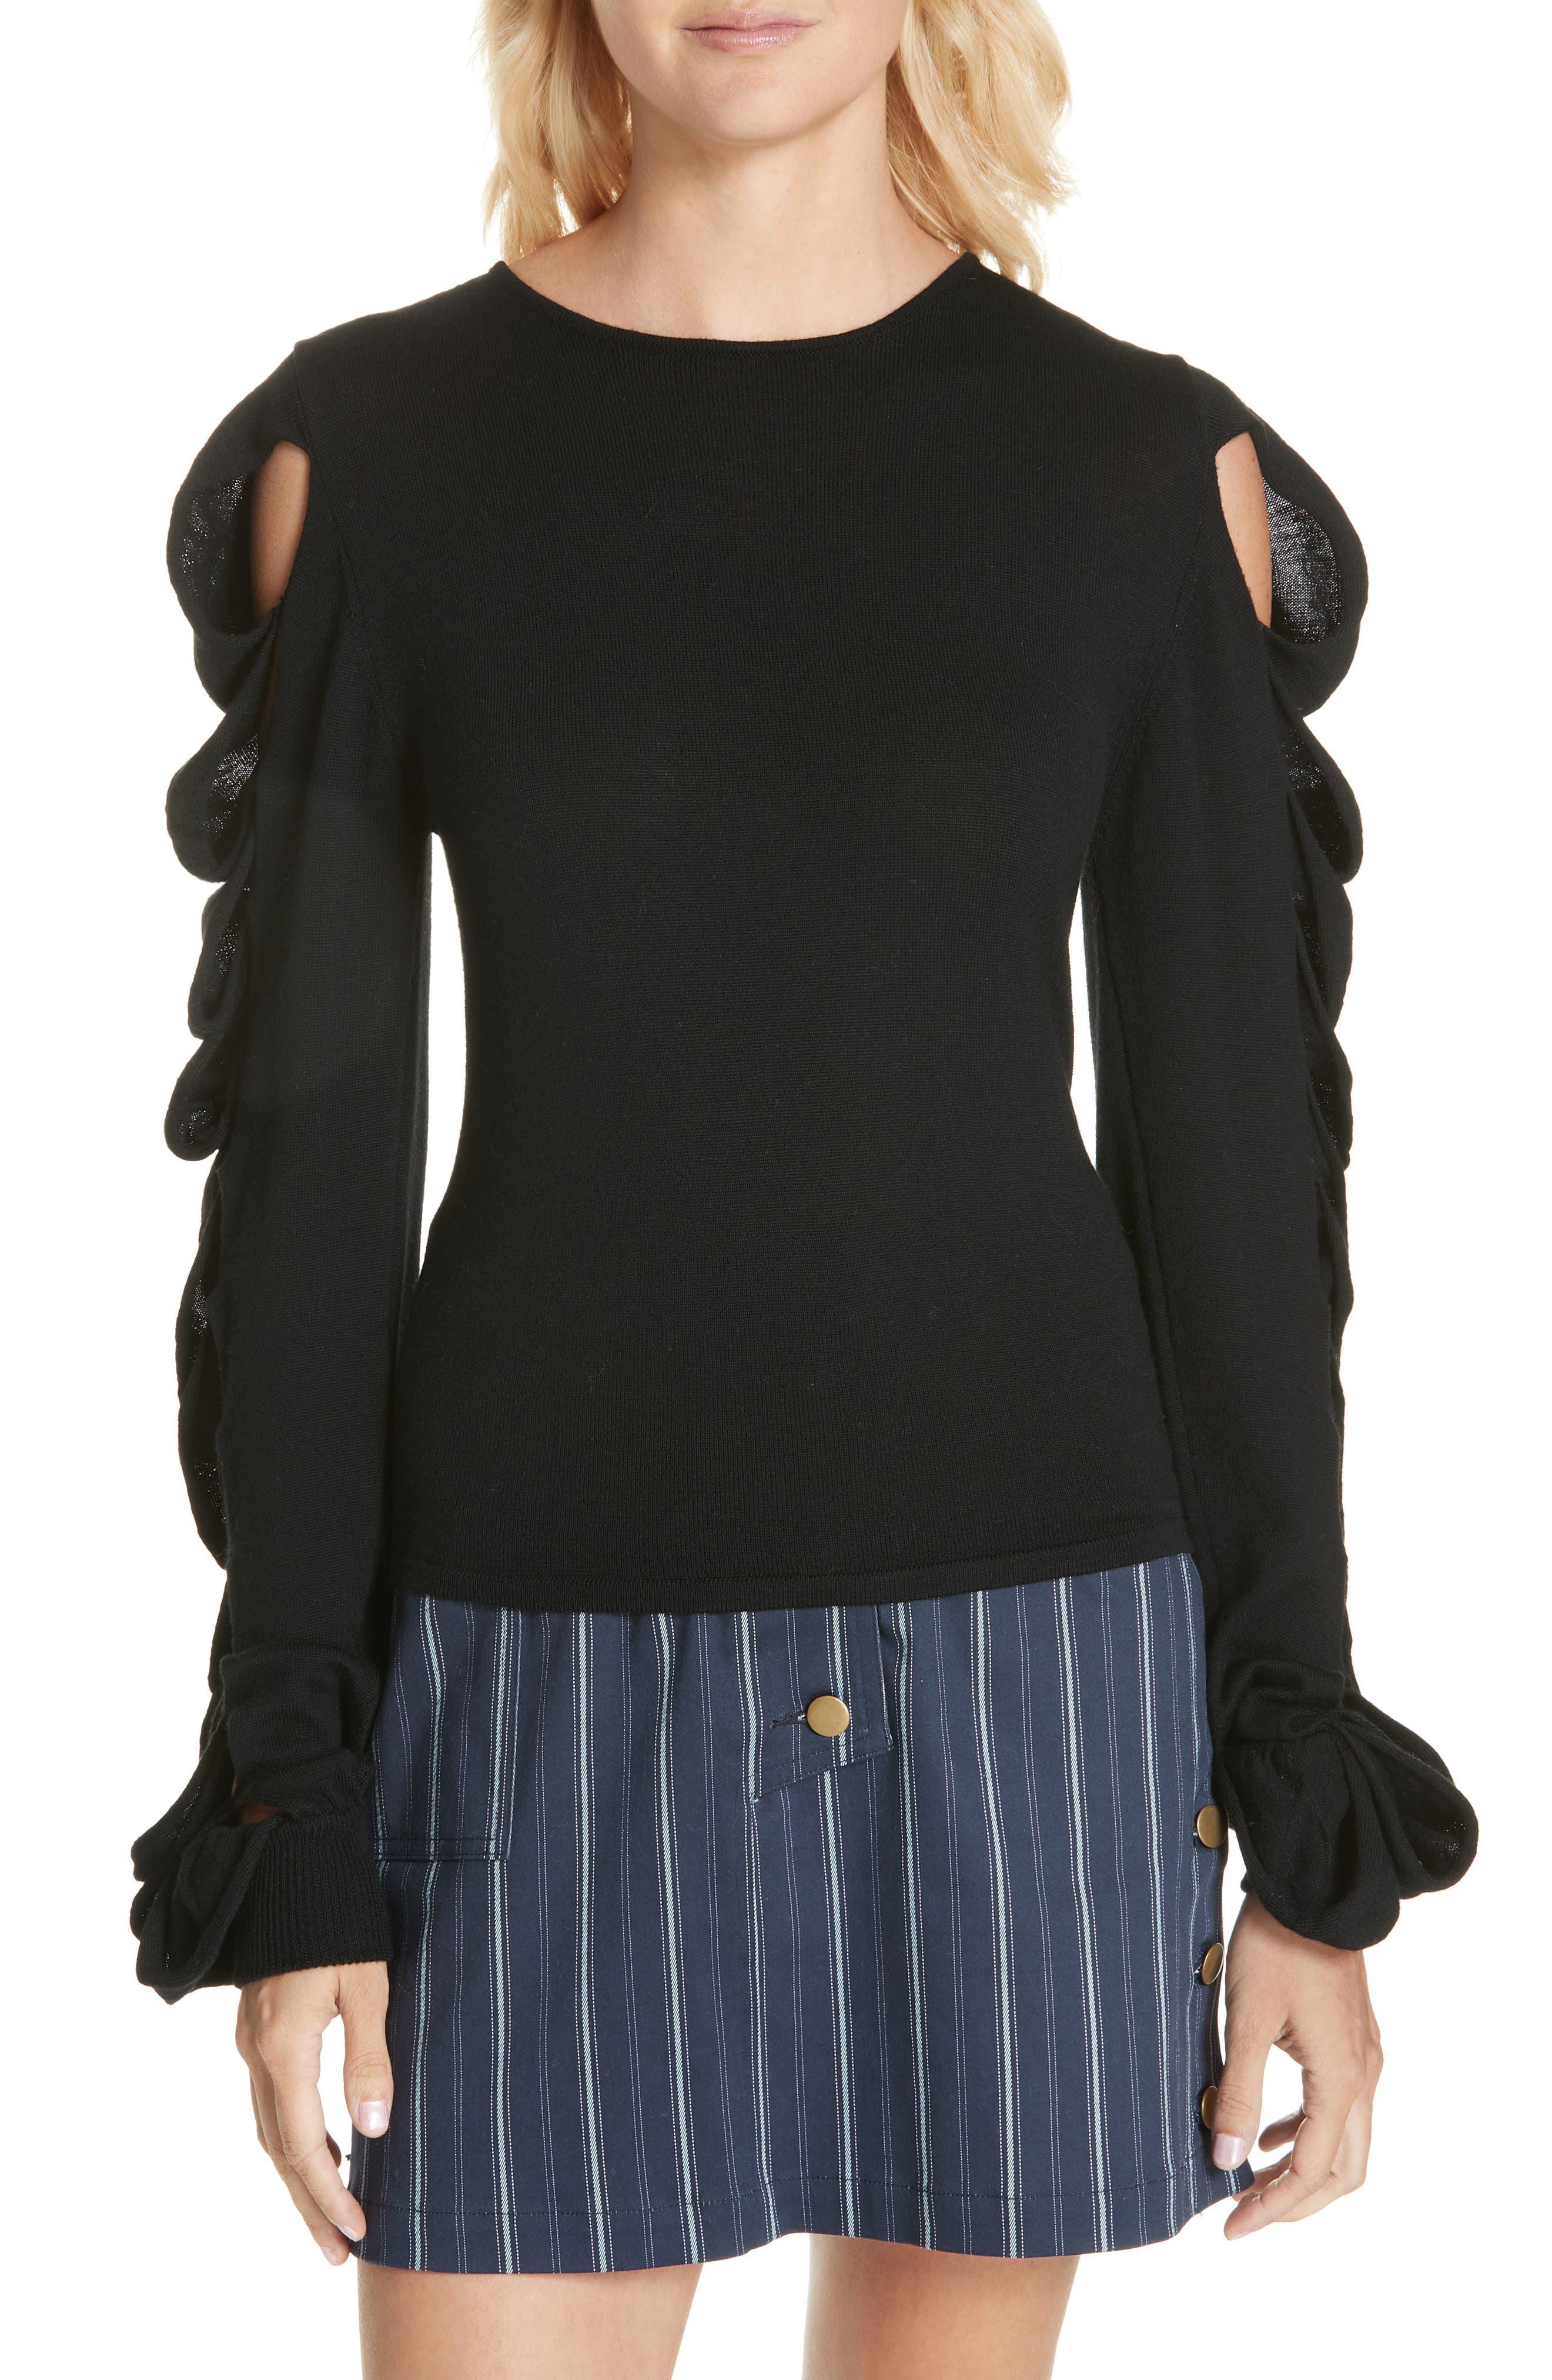 AMUR Alana Merino Wool & Cashmere Sweater in Black